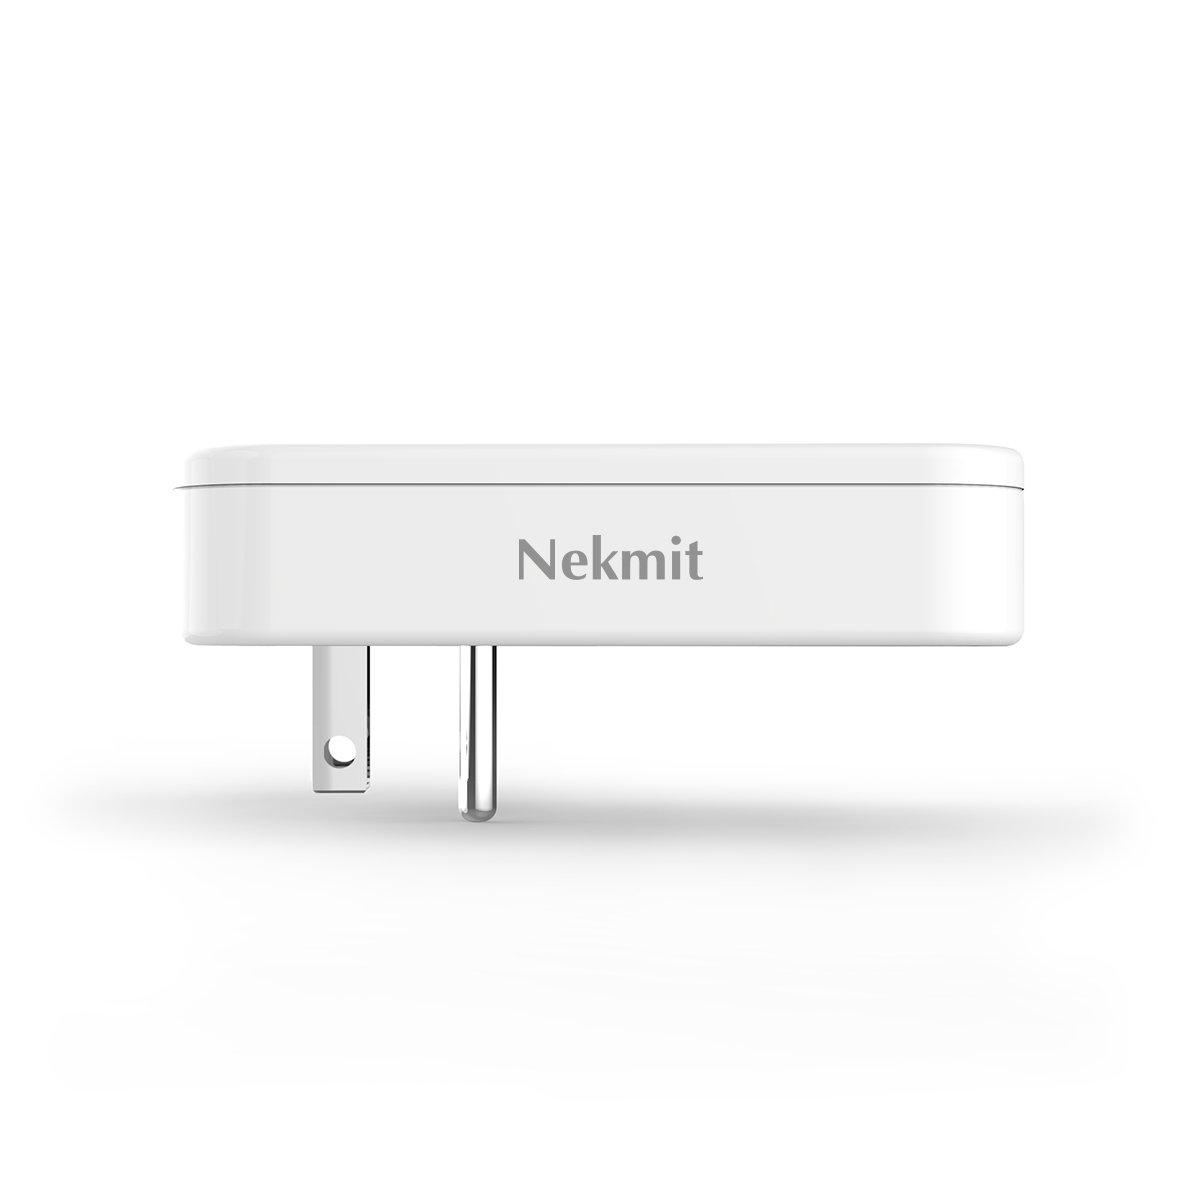 Nekmit Dual Port Ultra Thin Flat USB Wall Charger with Smart IC by Nekmit (Image #4)